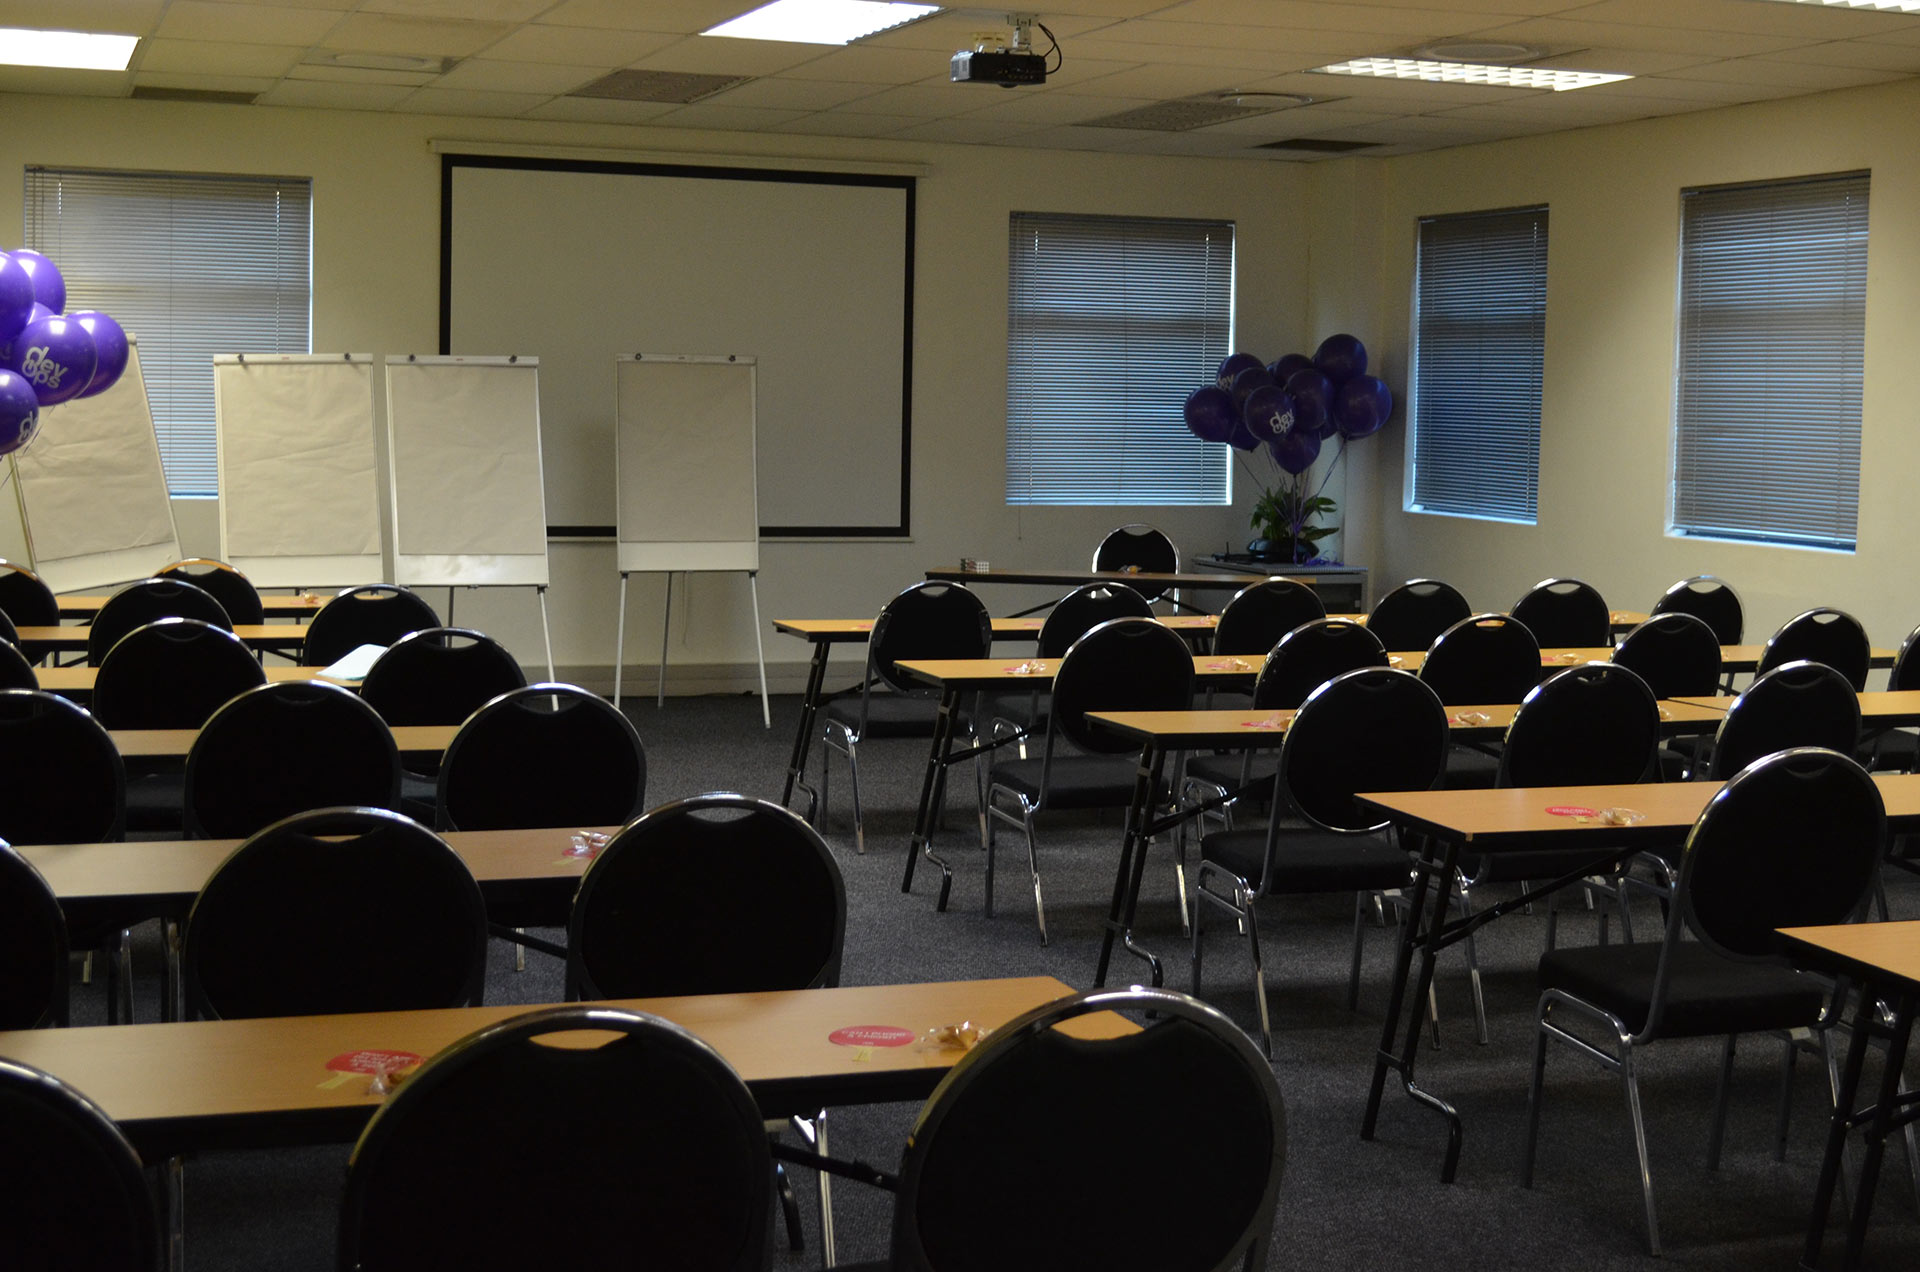 Venus - Presentation Room With Boards   Focus Rooms